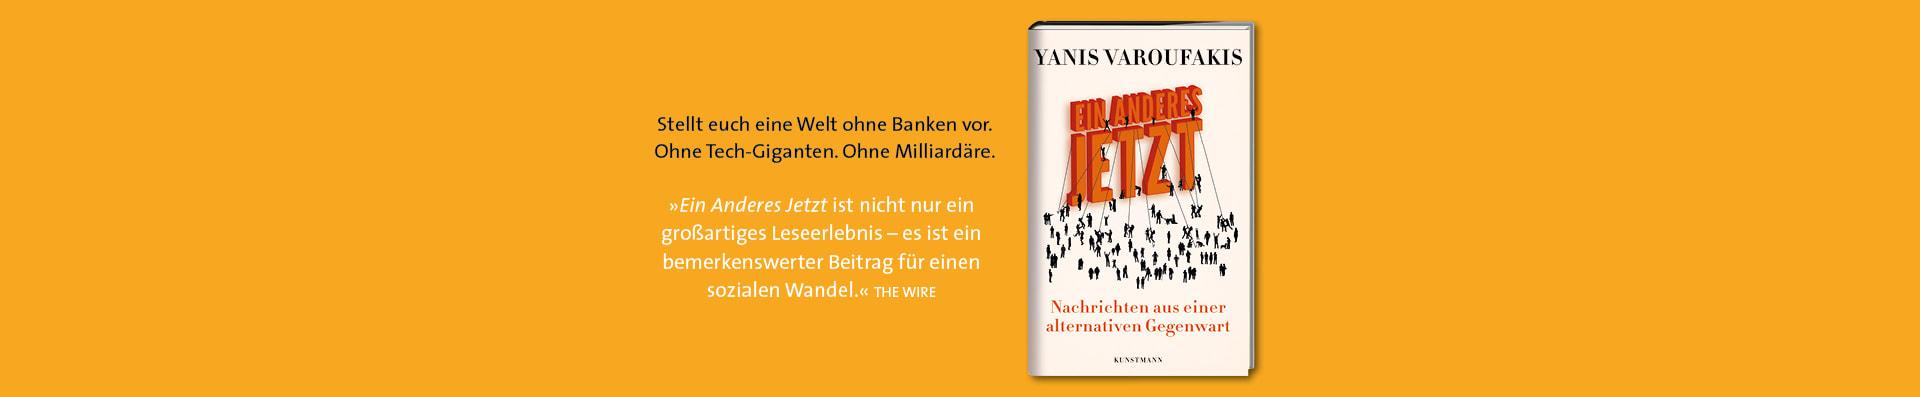 Yanis Varoufakis – Ein Anderes Jetzt